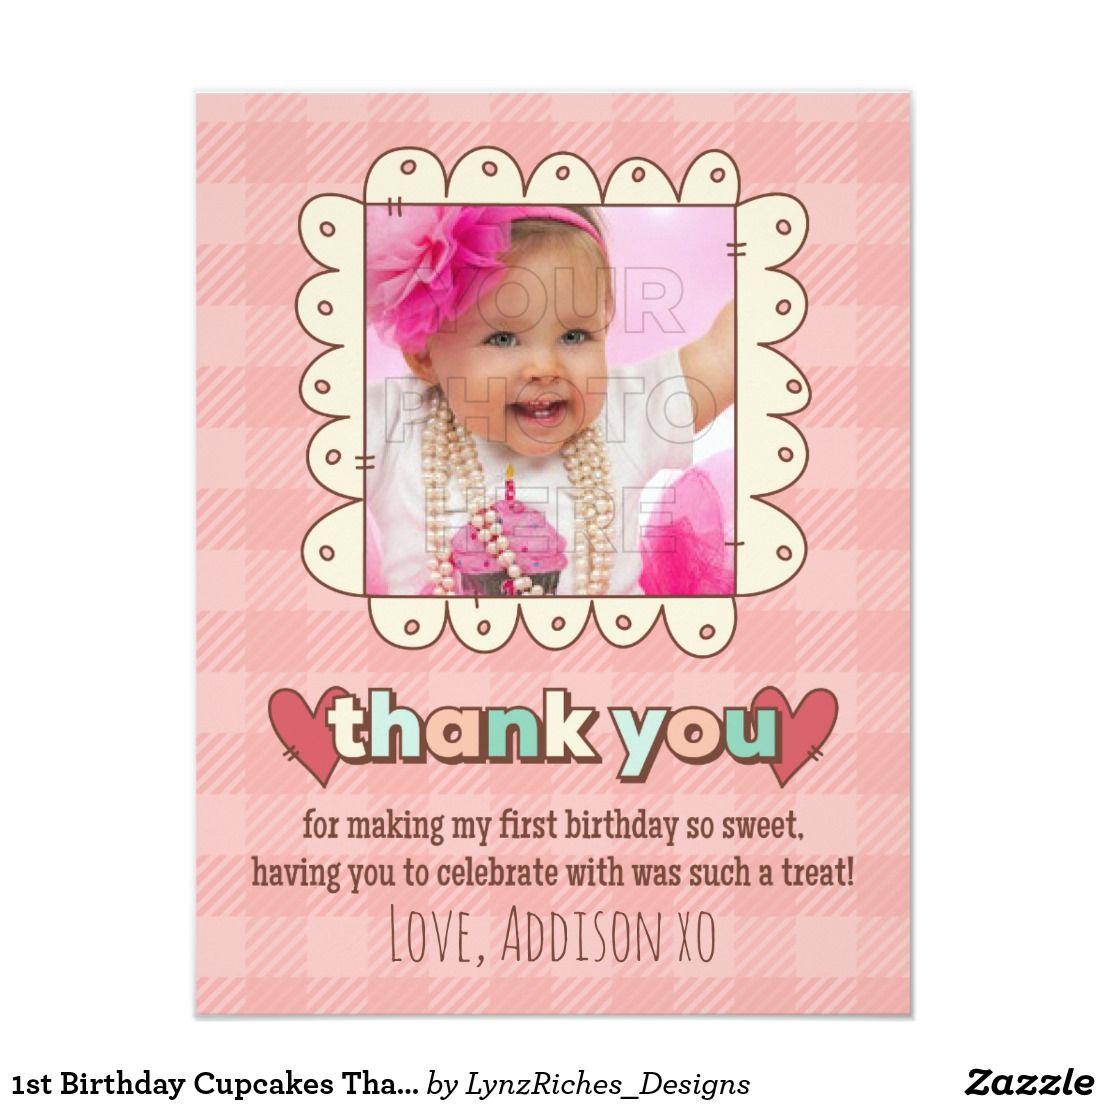 1st Birthday Cupcakes Thank You Card | Invitation cards | Pinterest ...